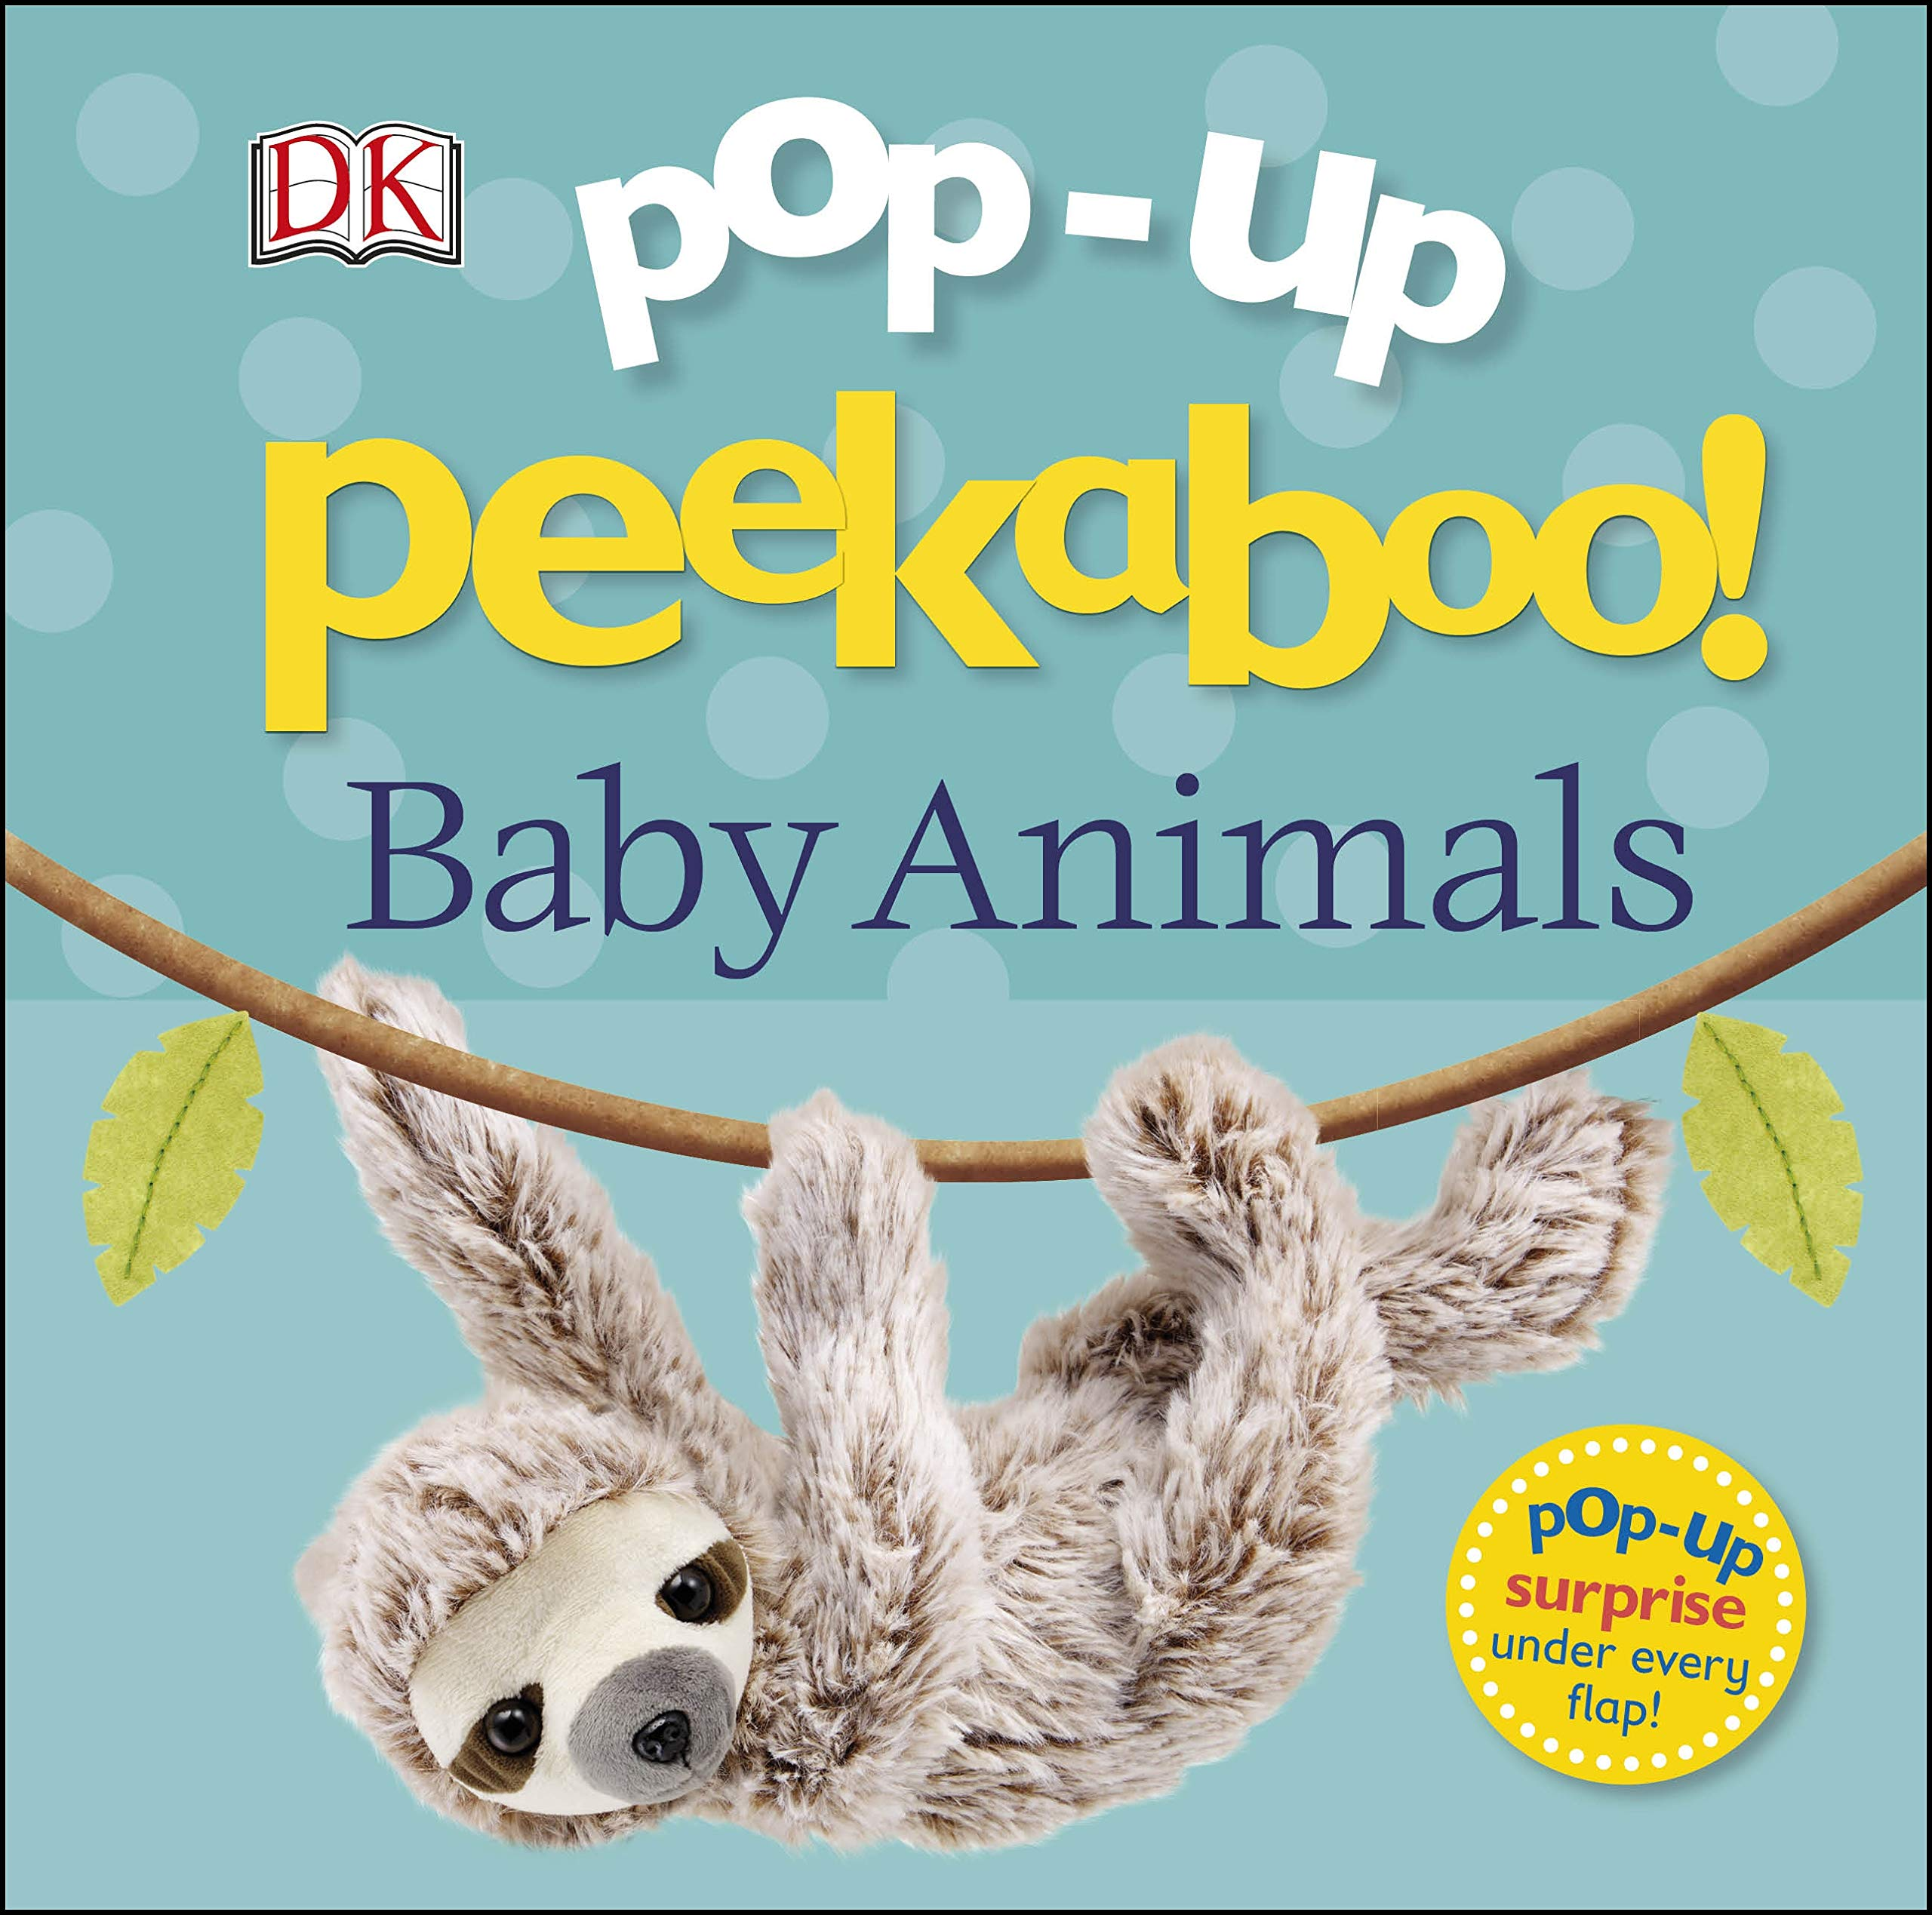 Pop-Up Peekaboo! Baby Animals: Amazon.co.uk: DK: Books